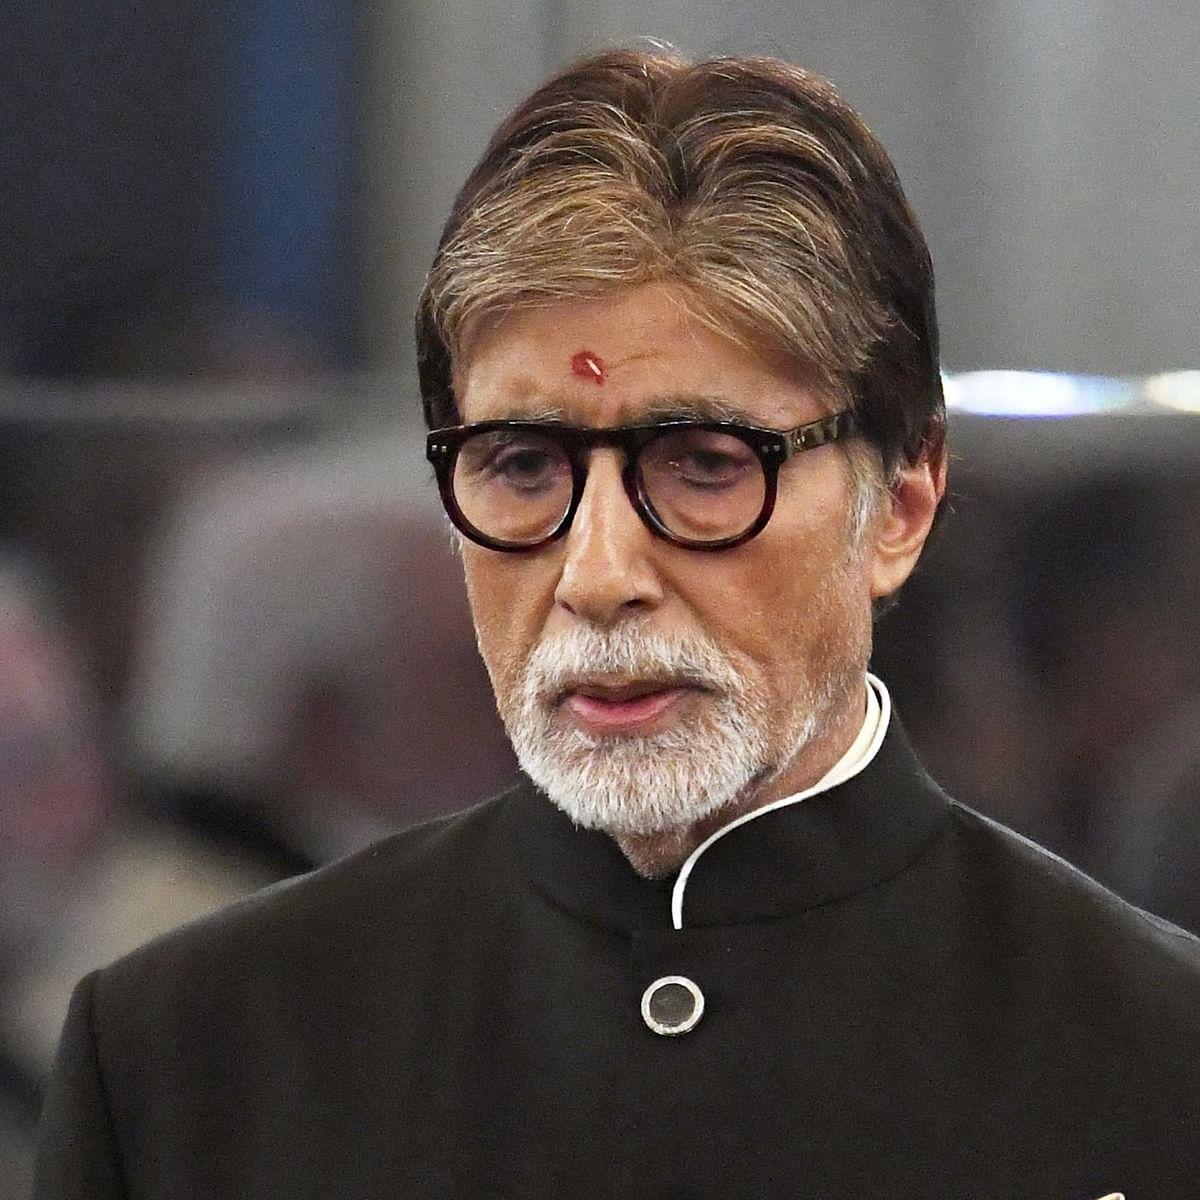 Amitabh Bachchan donates ventilators, medical equipment worth Rs 1.75 crore to civic hospital in Mumbai